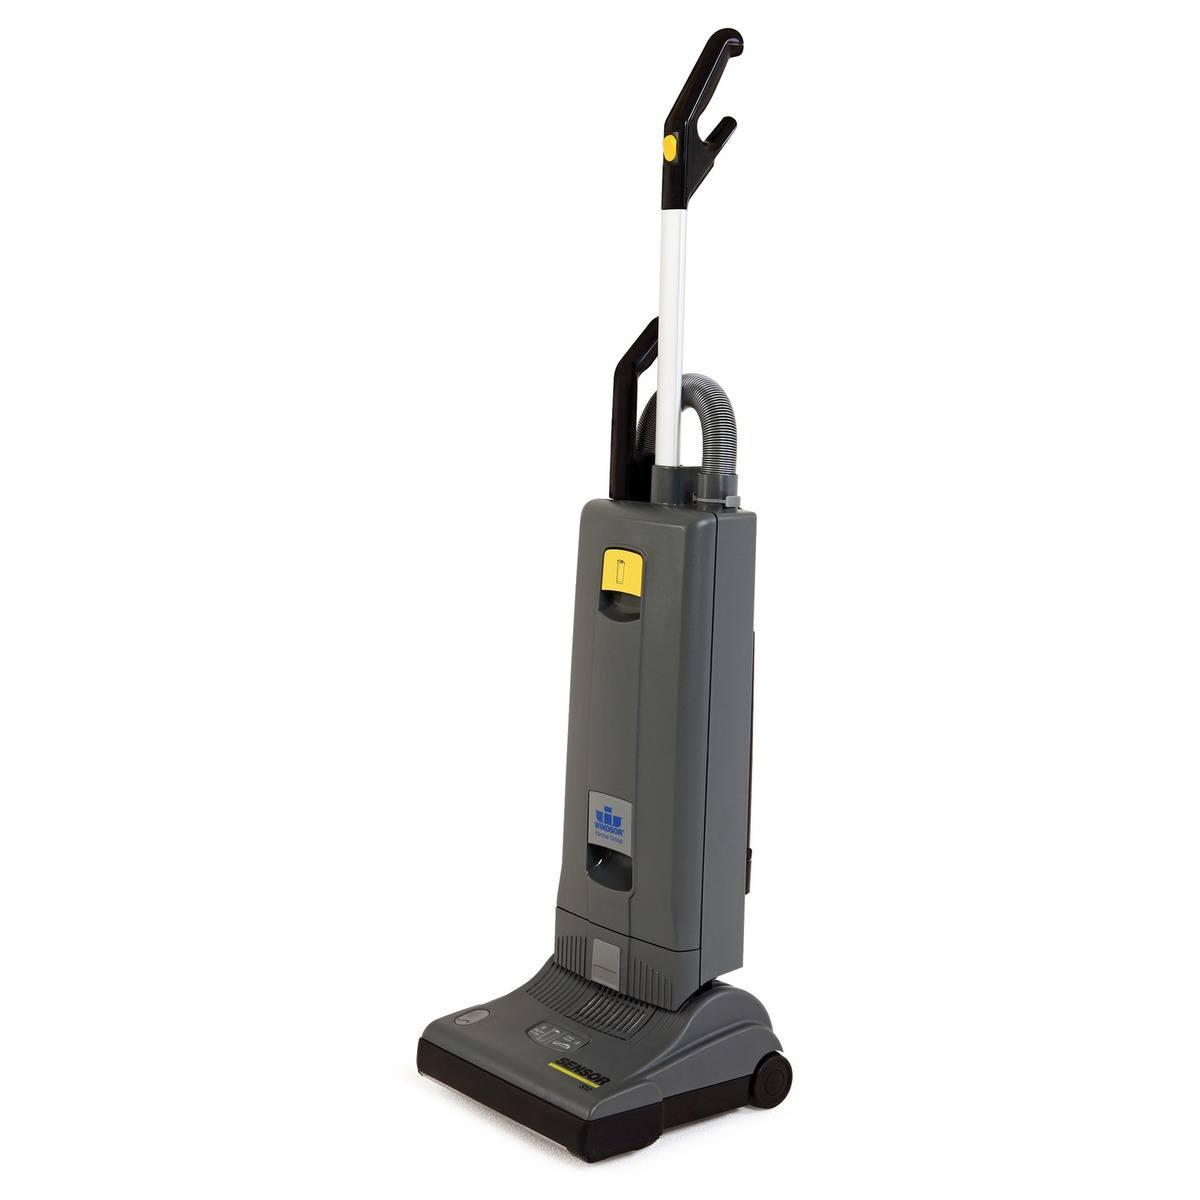 Windsor Commercial Vacuums Evacuumstore Com